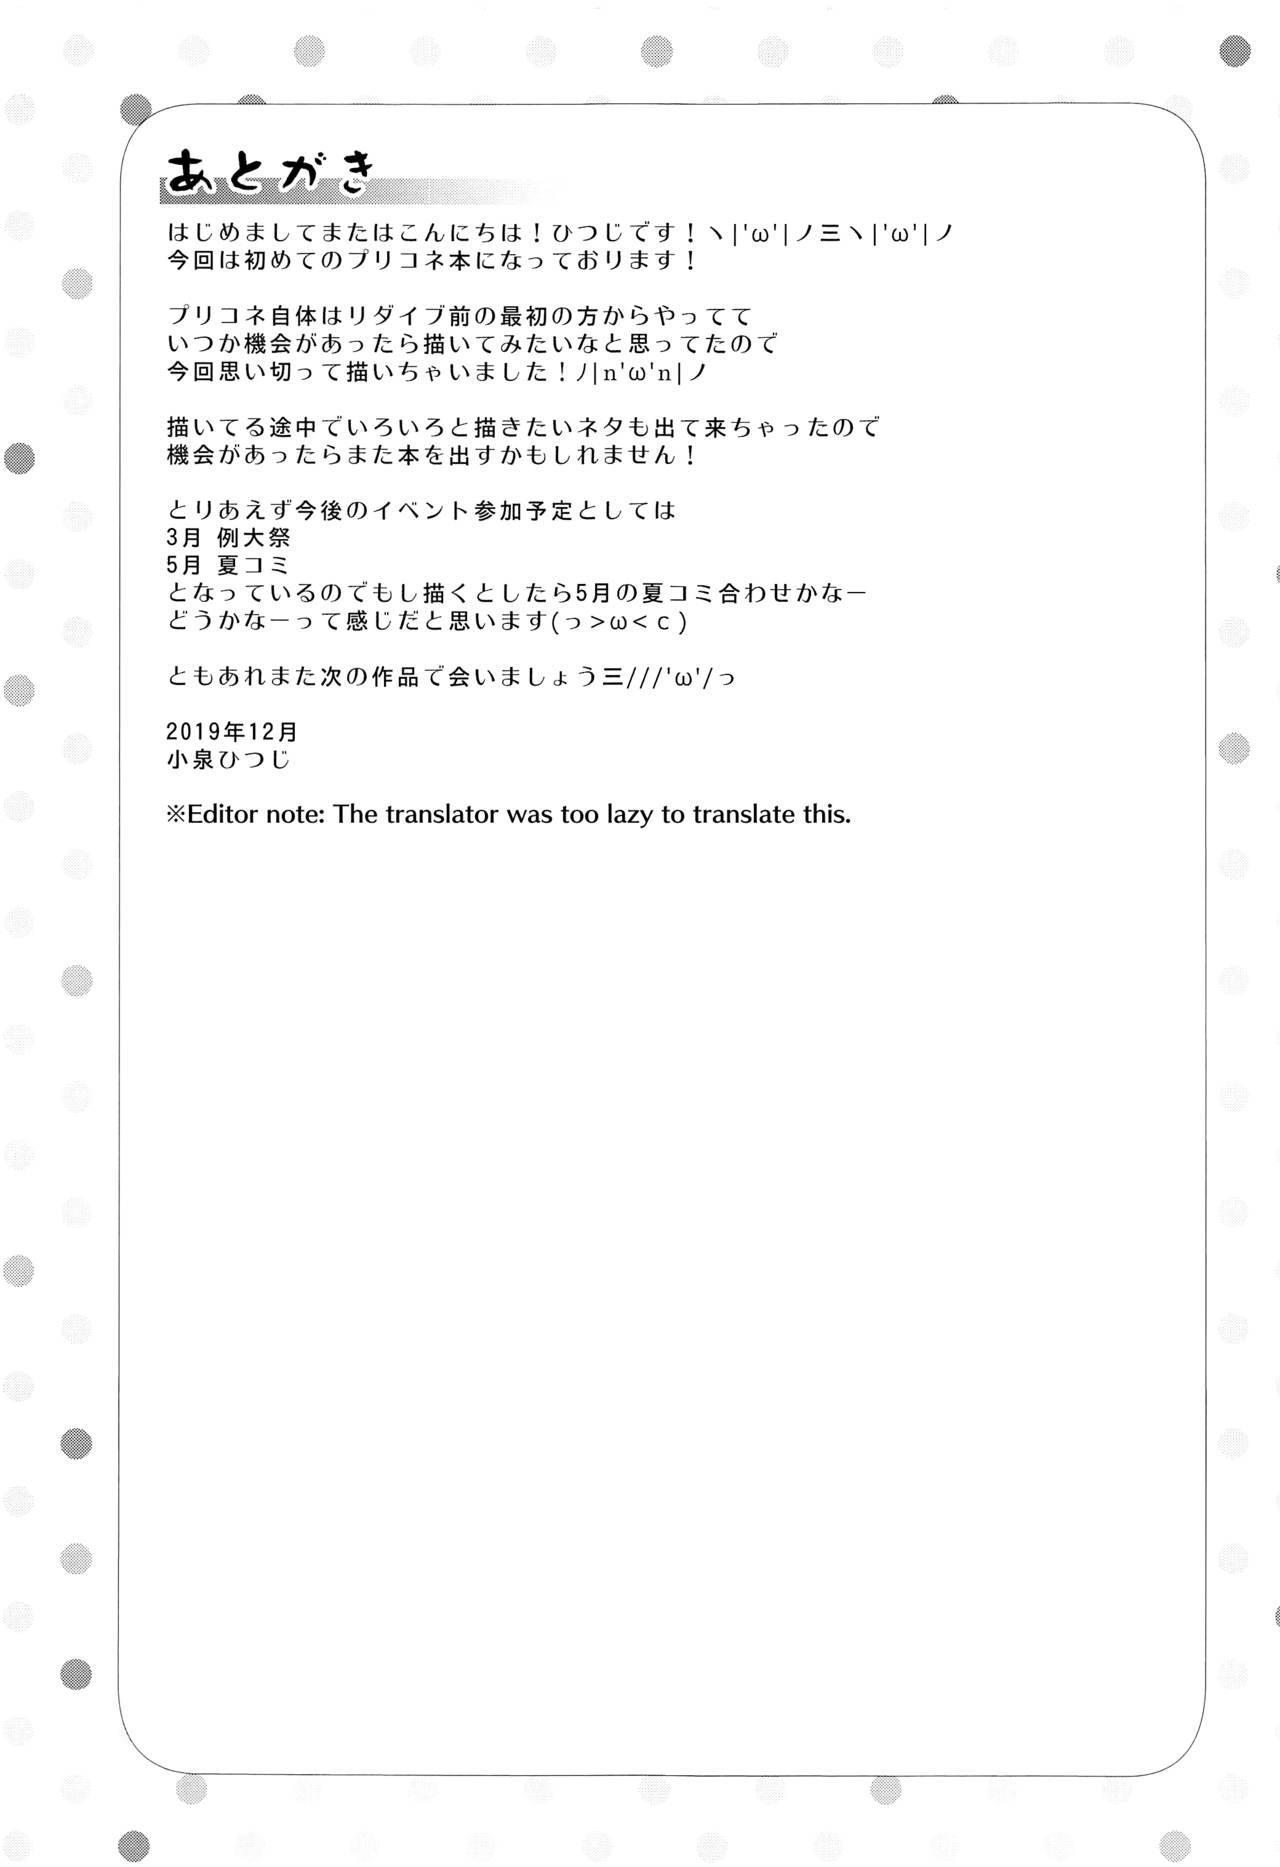 (C97) [Divine Fountain (Koizumi Hitsuji)] Hypnotic Perverted Sex With Kyouka-chan!! | Kyouka-chan to Saimin Hentai Ecchi!! (Princess Connect! Re:Dive) [English] [Melty Scans] 23